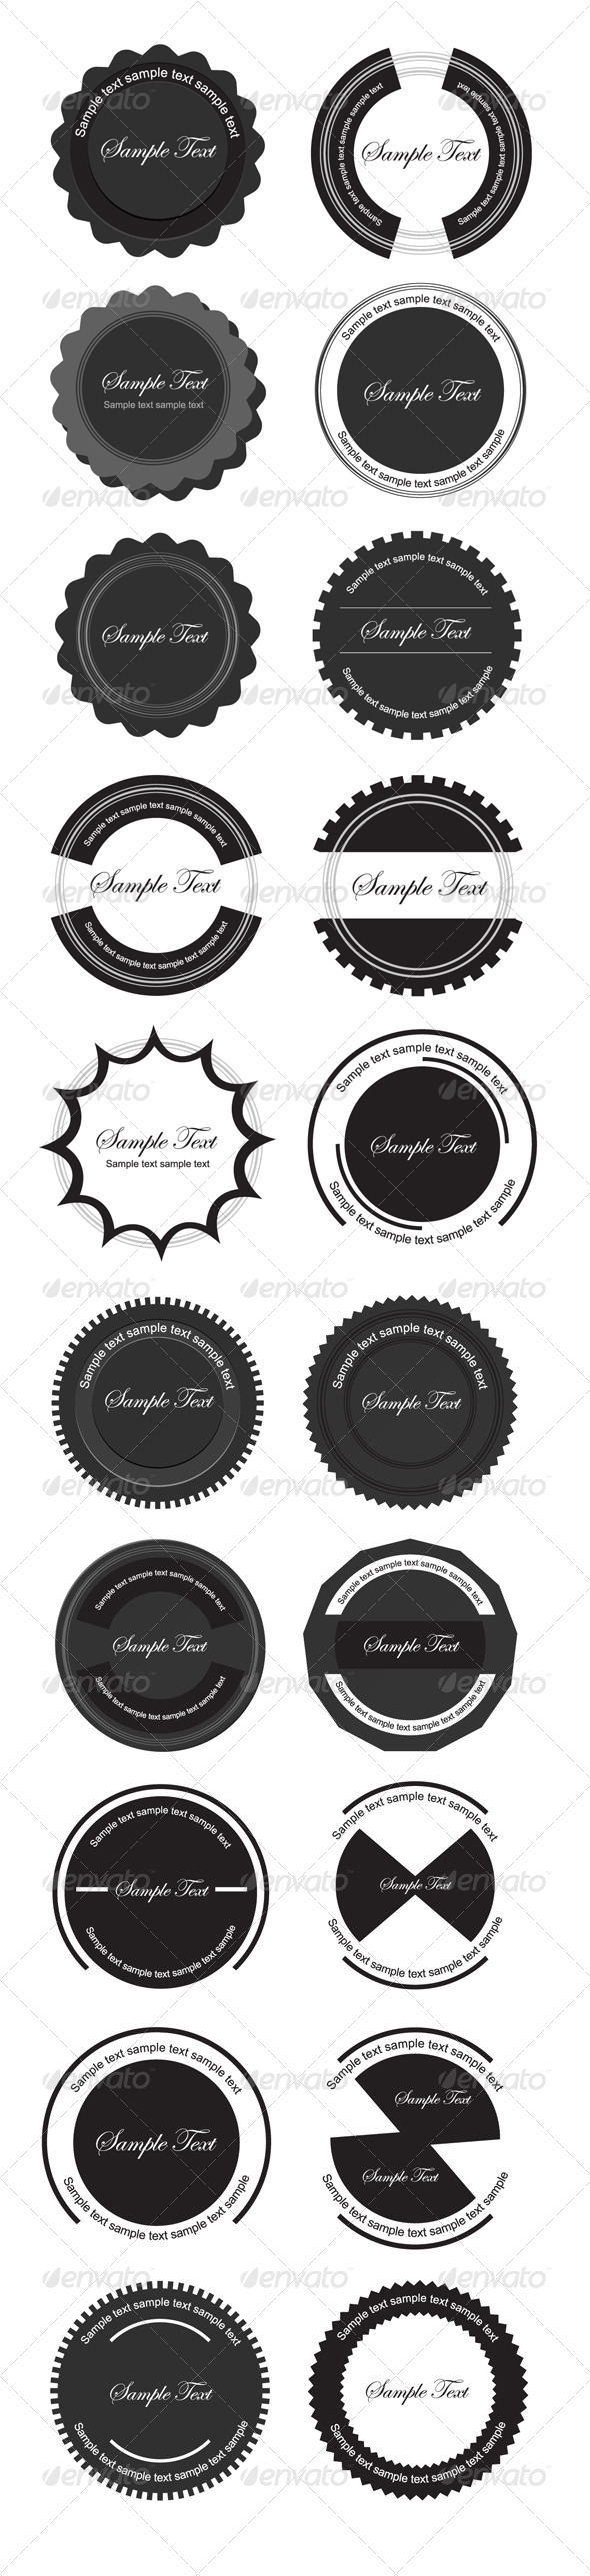 GraphicRiver Vintage Labels 4531578